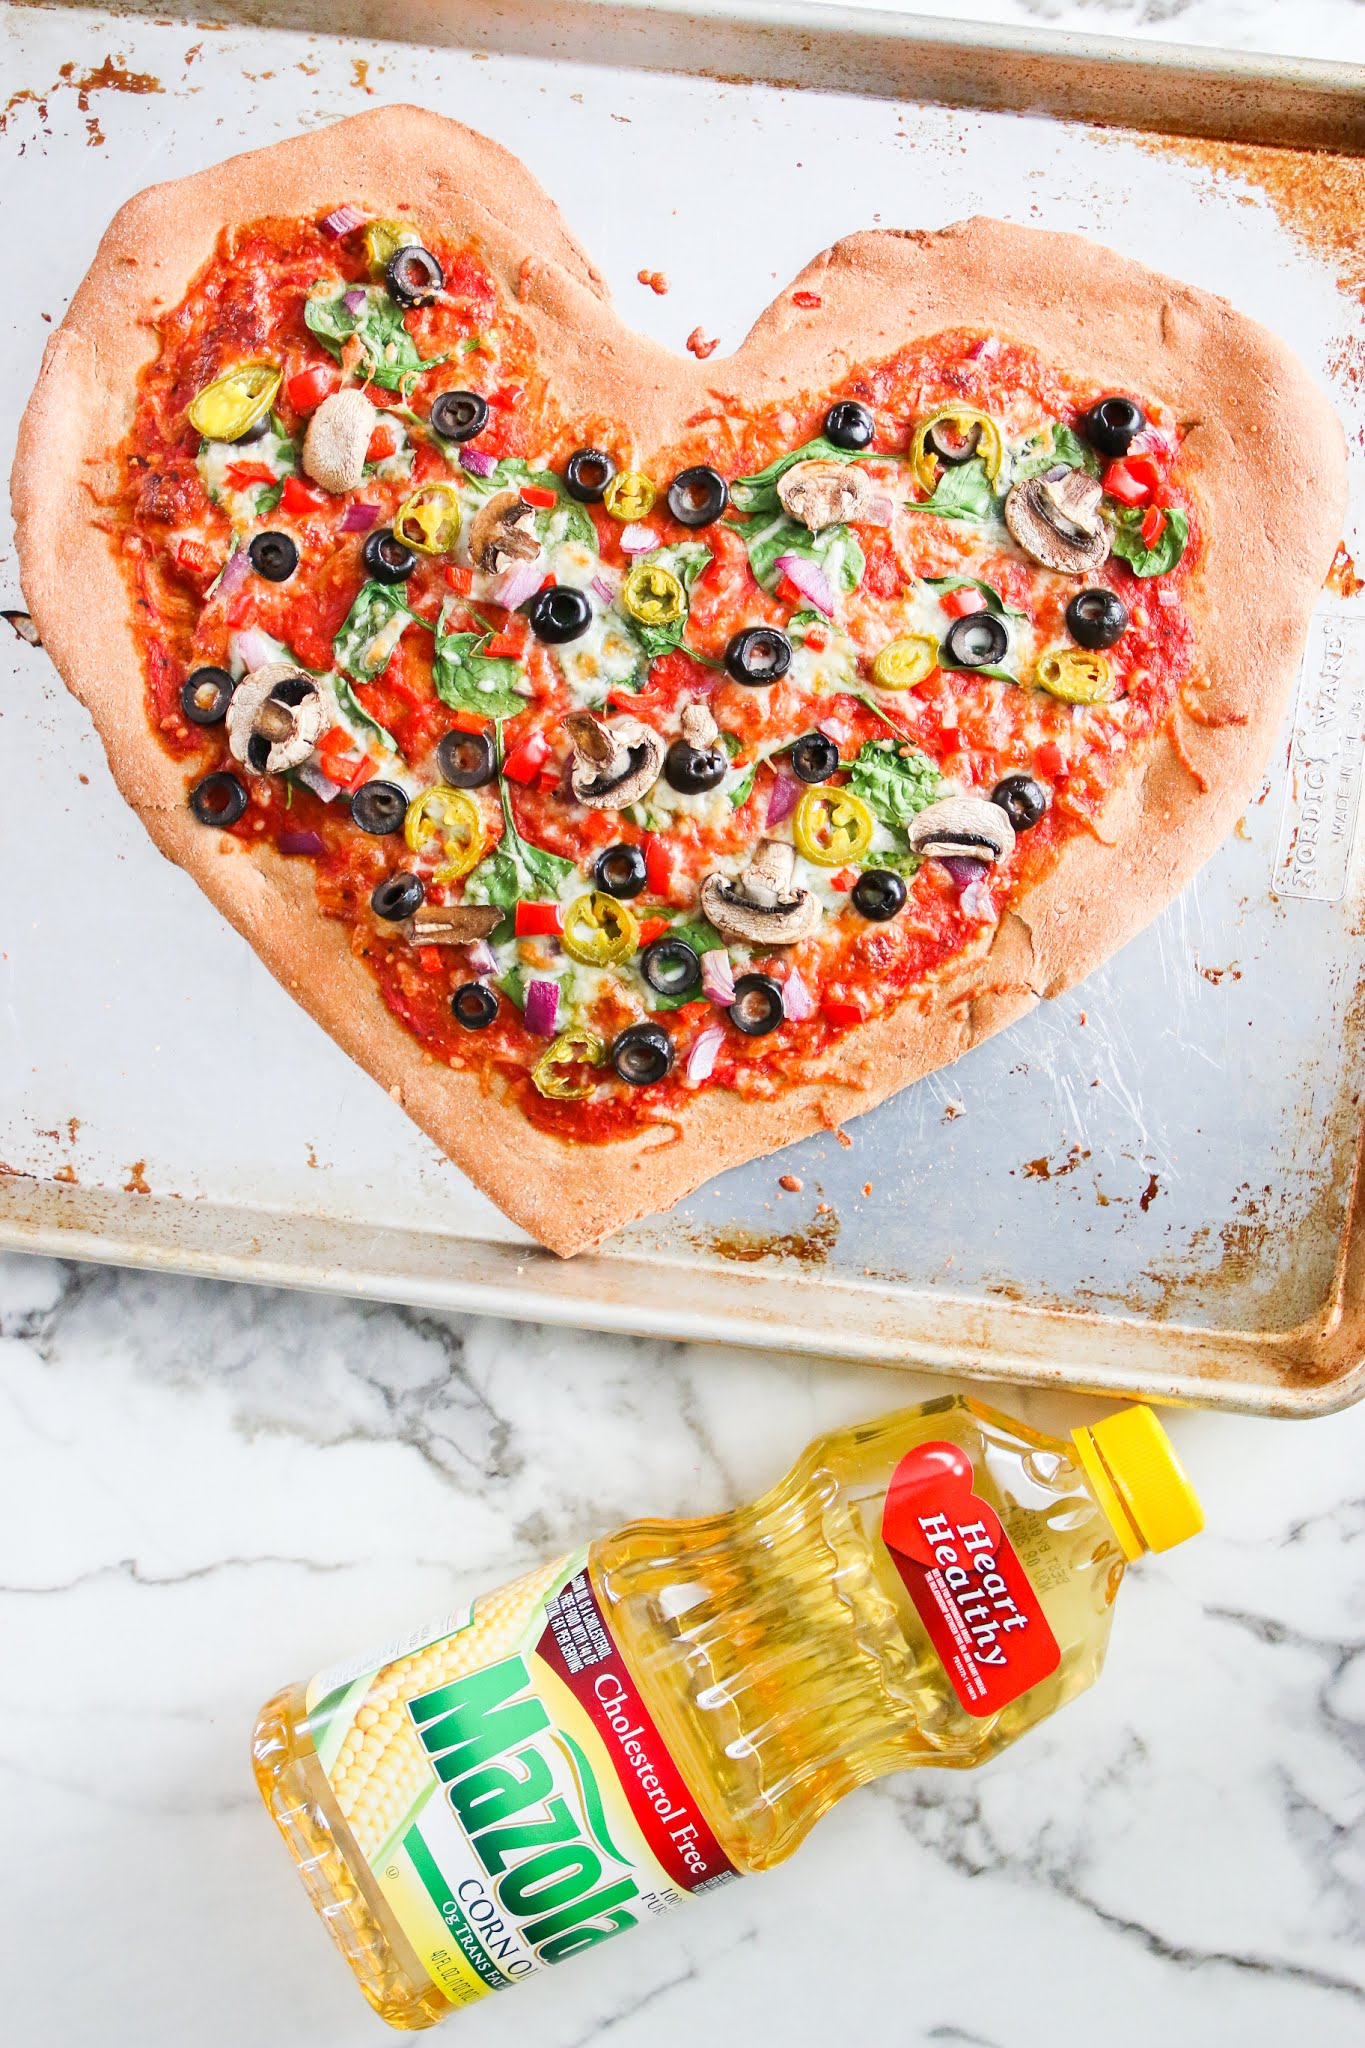 Vegetarian pizza toppings. Whole wheat veggie pizza calories. Thin crust veggie pizza recipe. Whole wheat pizza dough Gourmet vegetarian pizza recipe. Vegetarian pizza ingredients. Italian vegetarian pizza. Spicy vegetarian pizza. #pizza #dinner #family #familyfun #dough